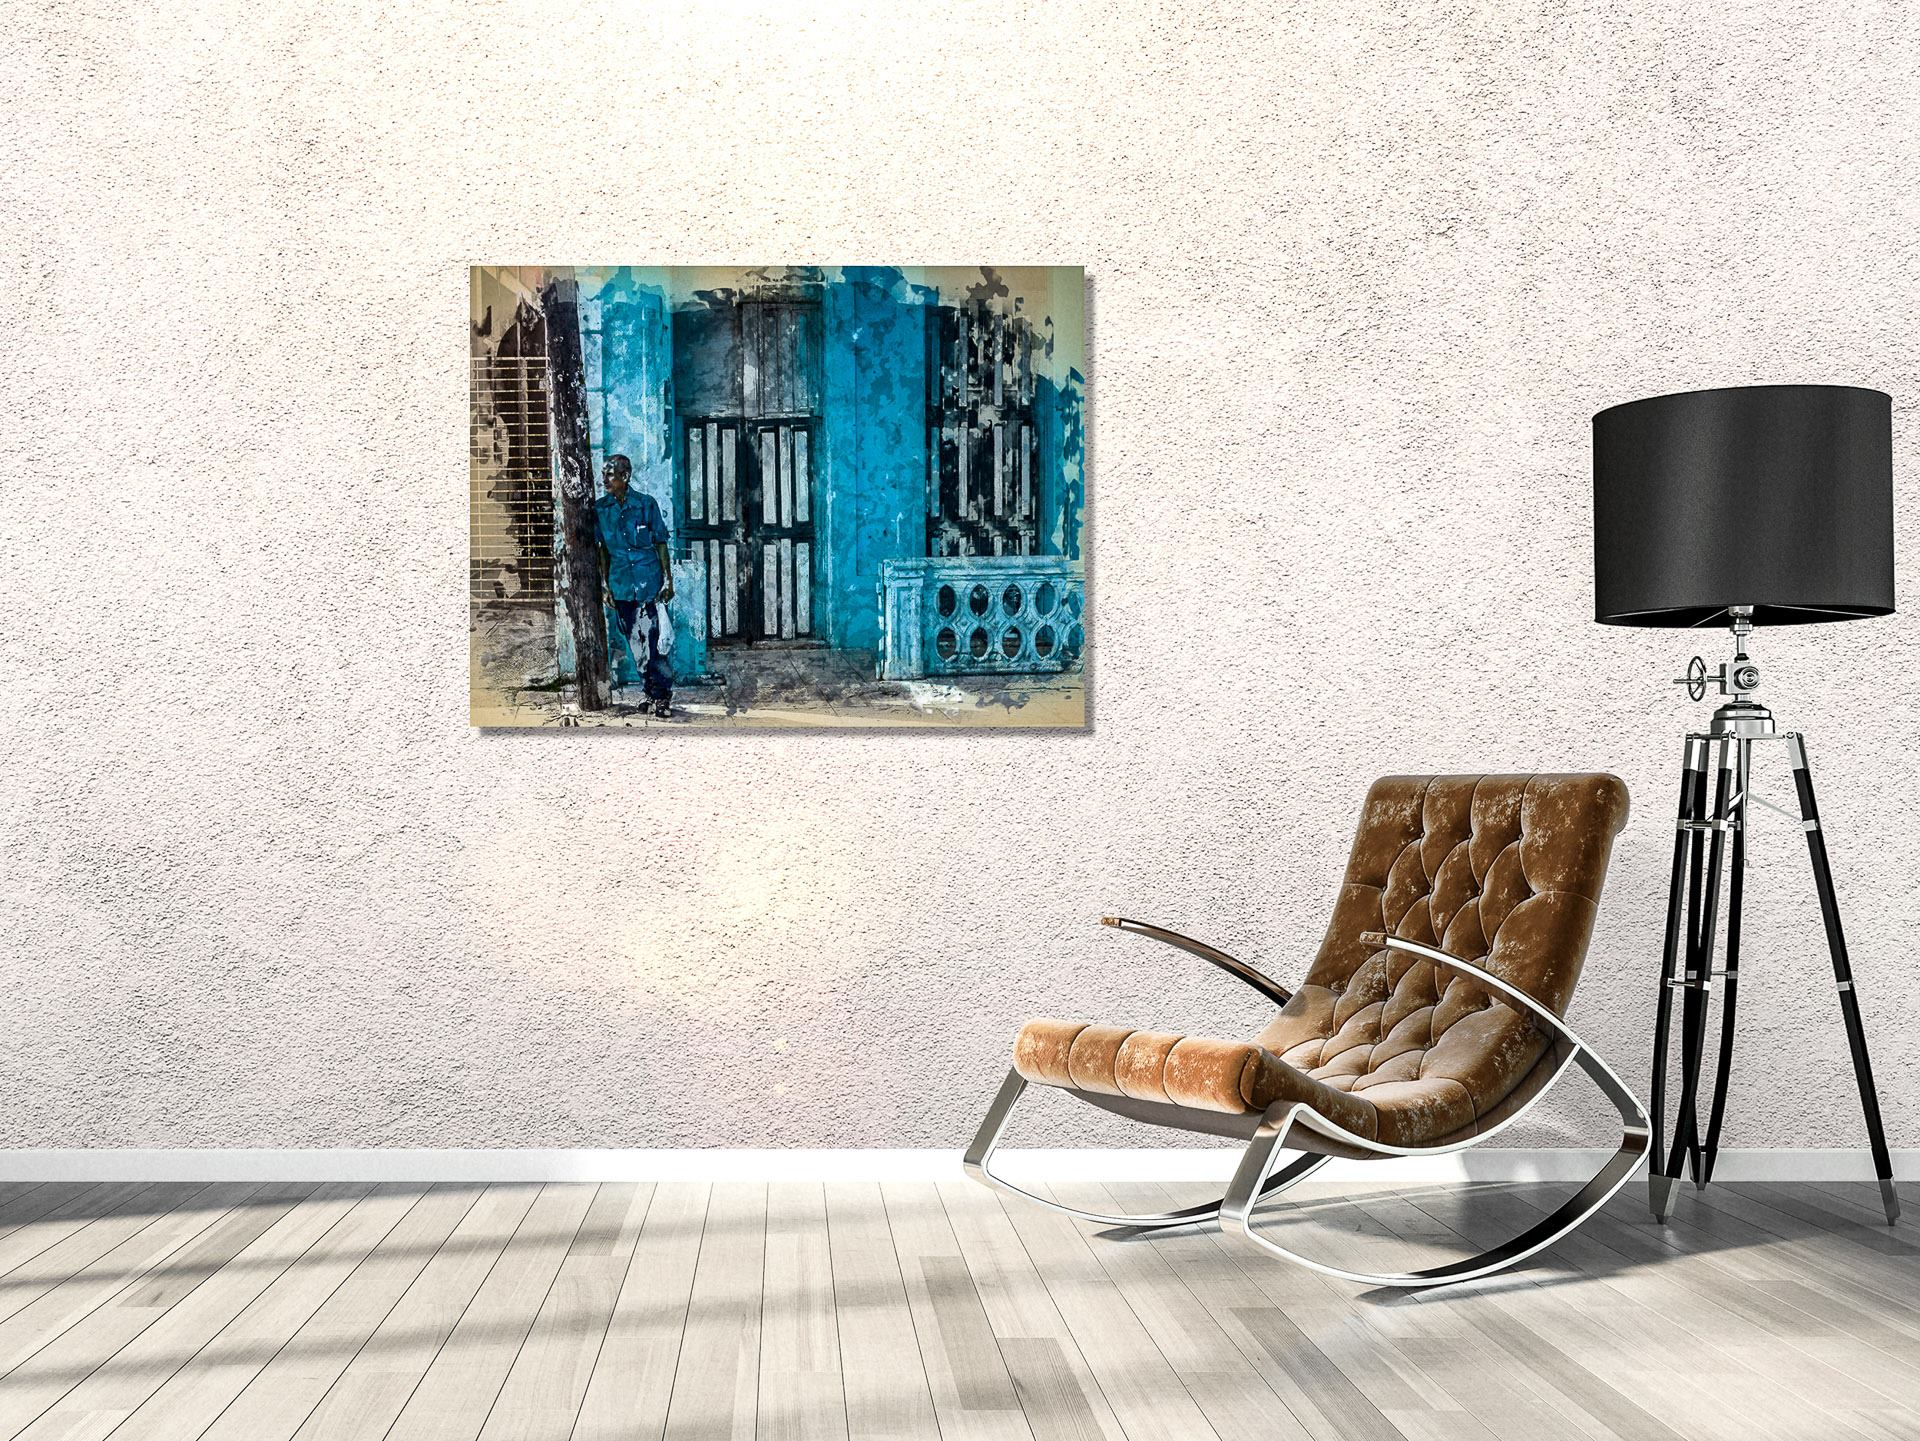 ArtBoja Room Accented with a Custom Wall Decor Print